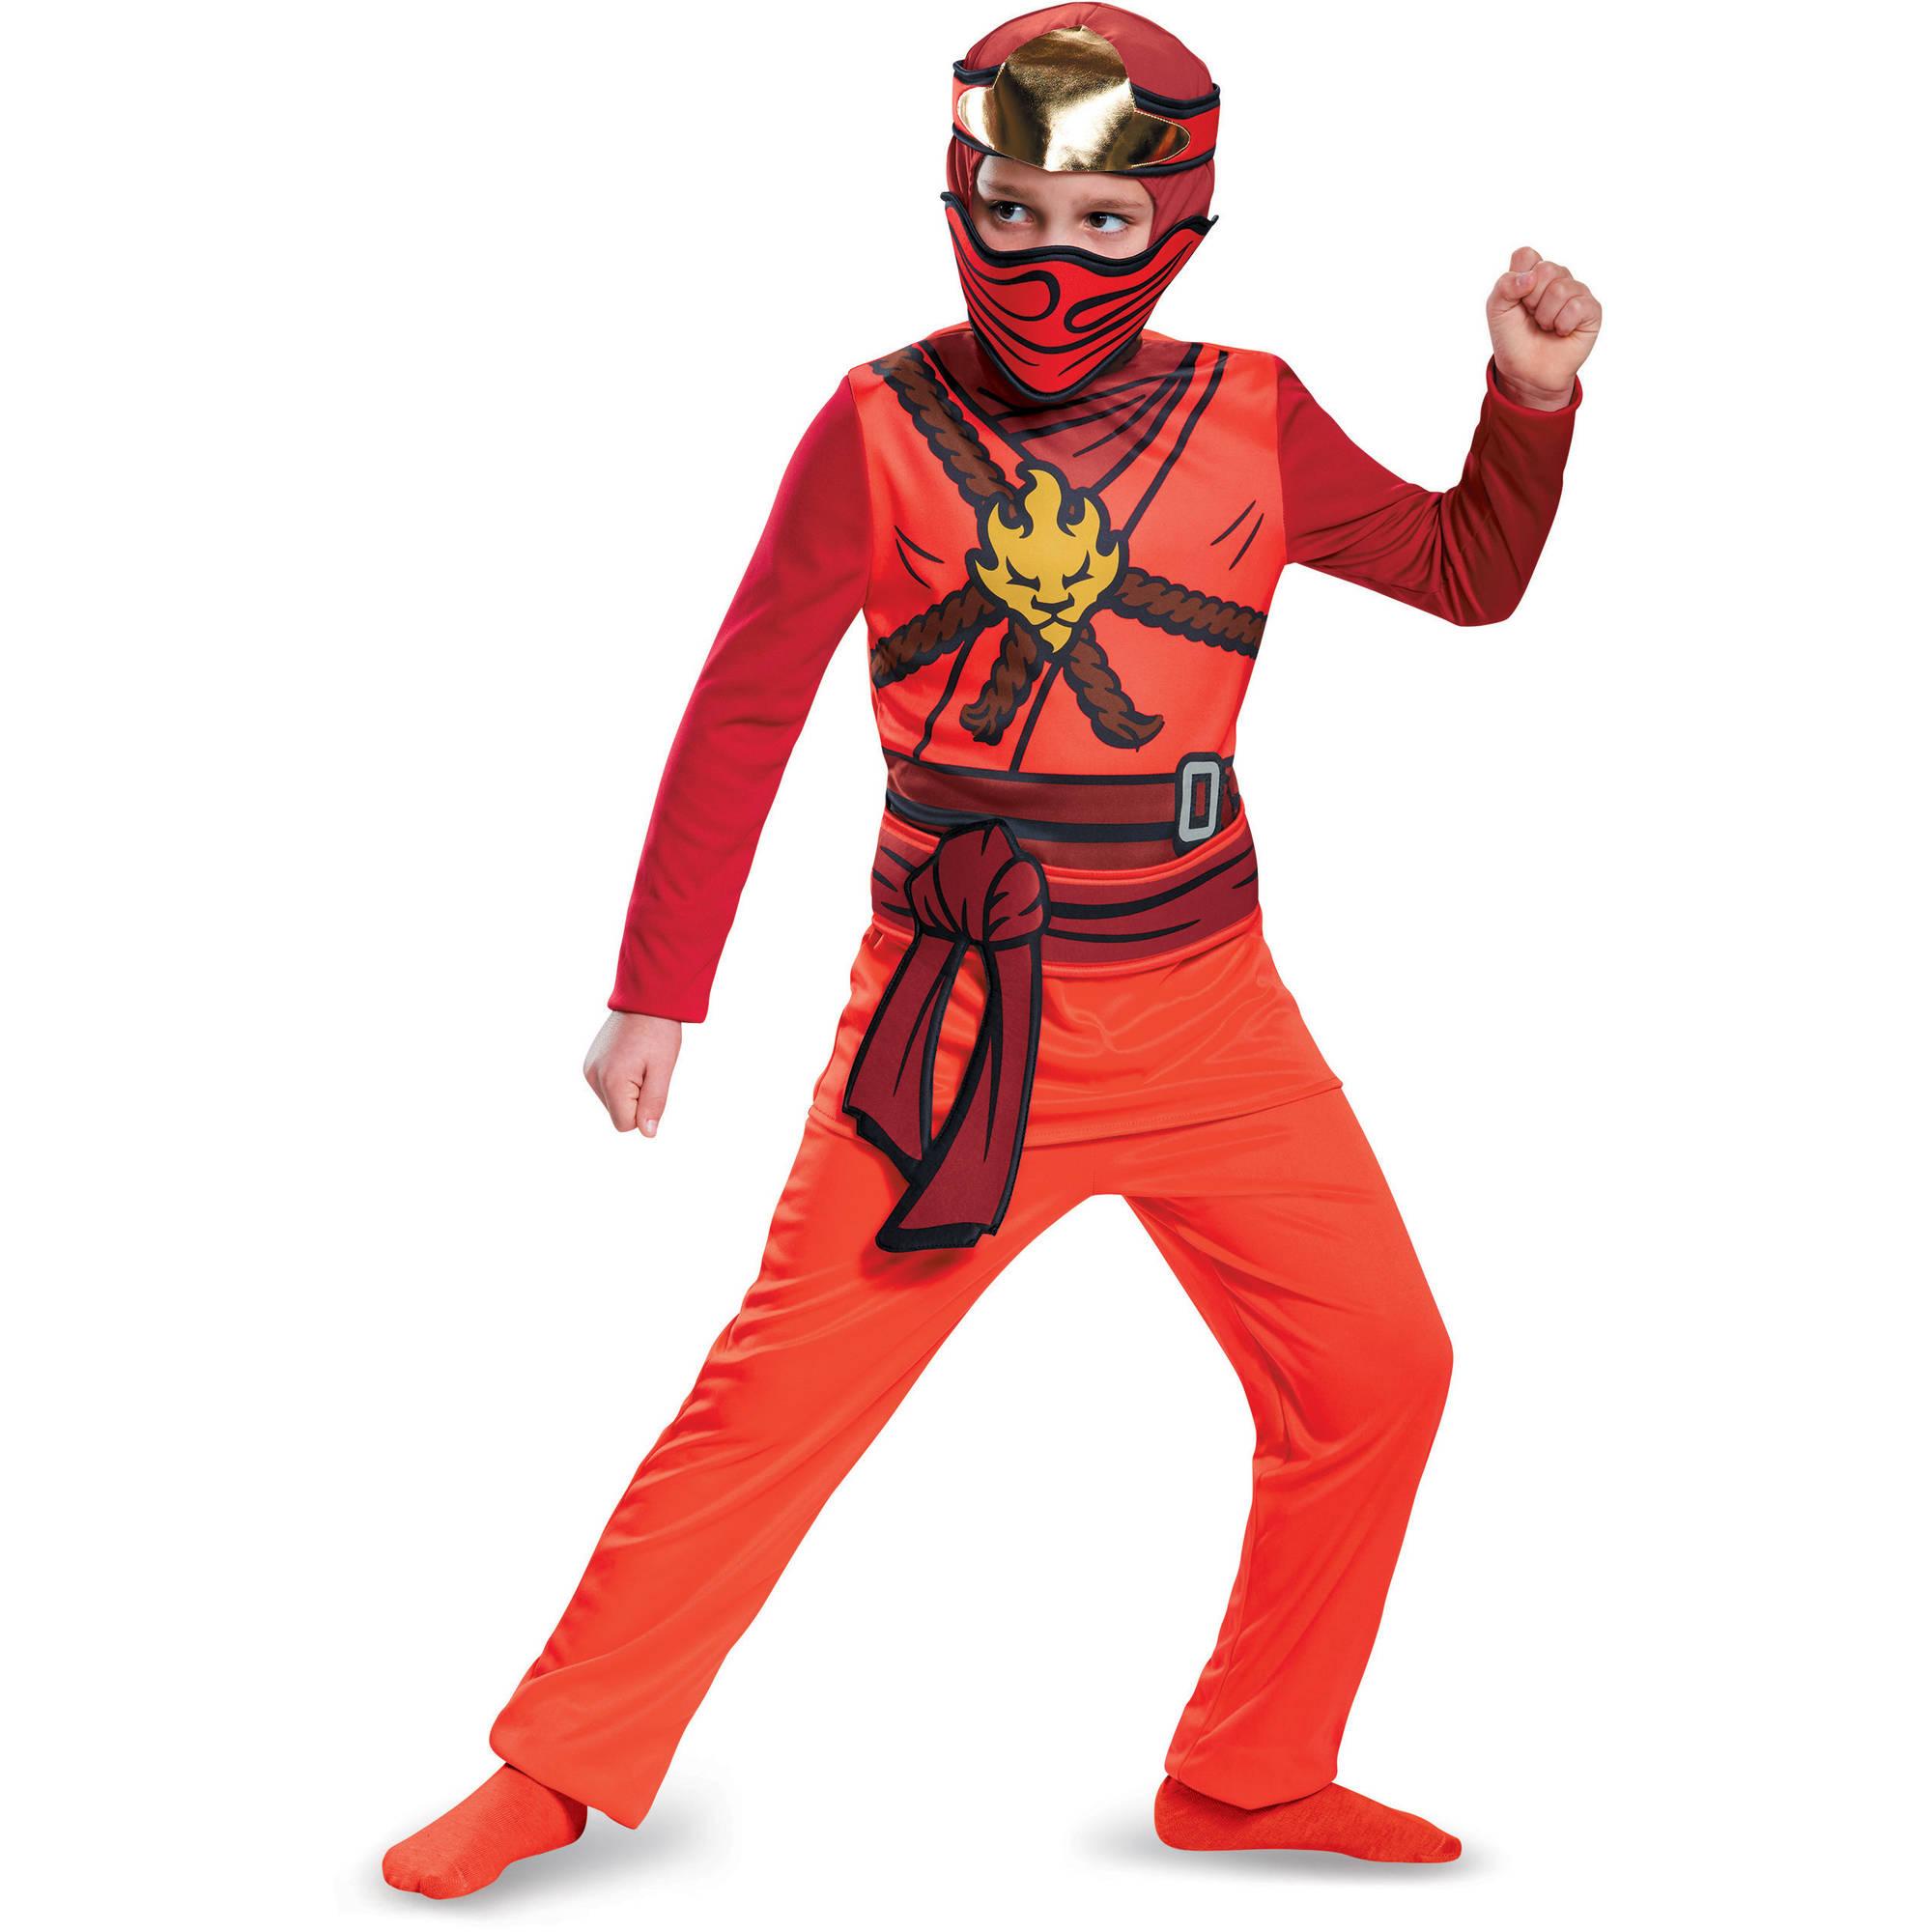 Bien-aimé Costume Halloween Ninjago | Goshowmeenergy LM68